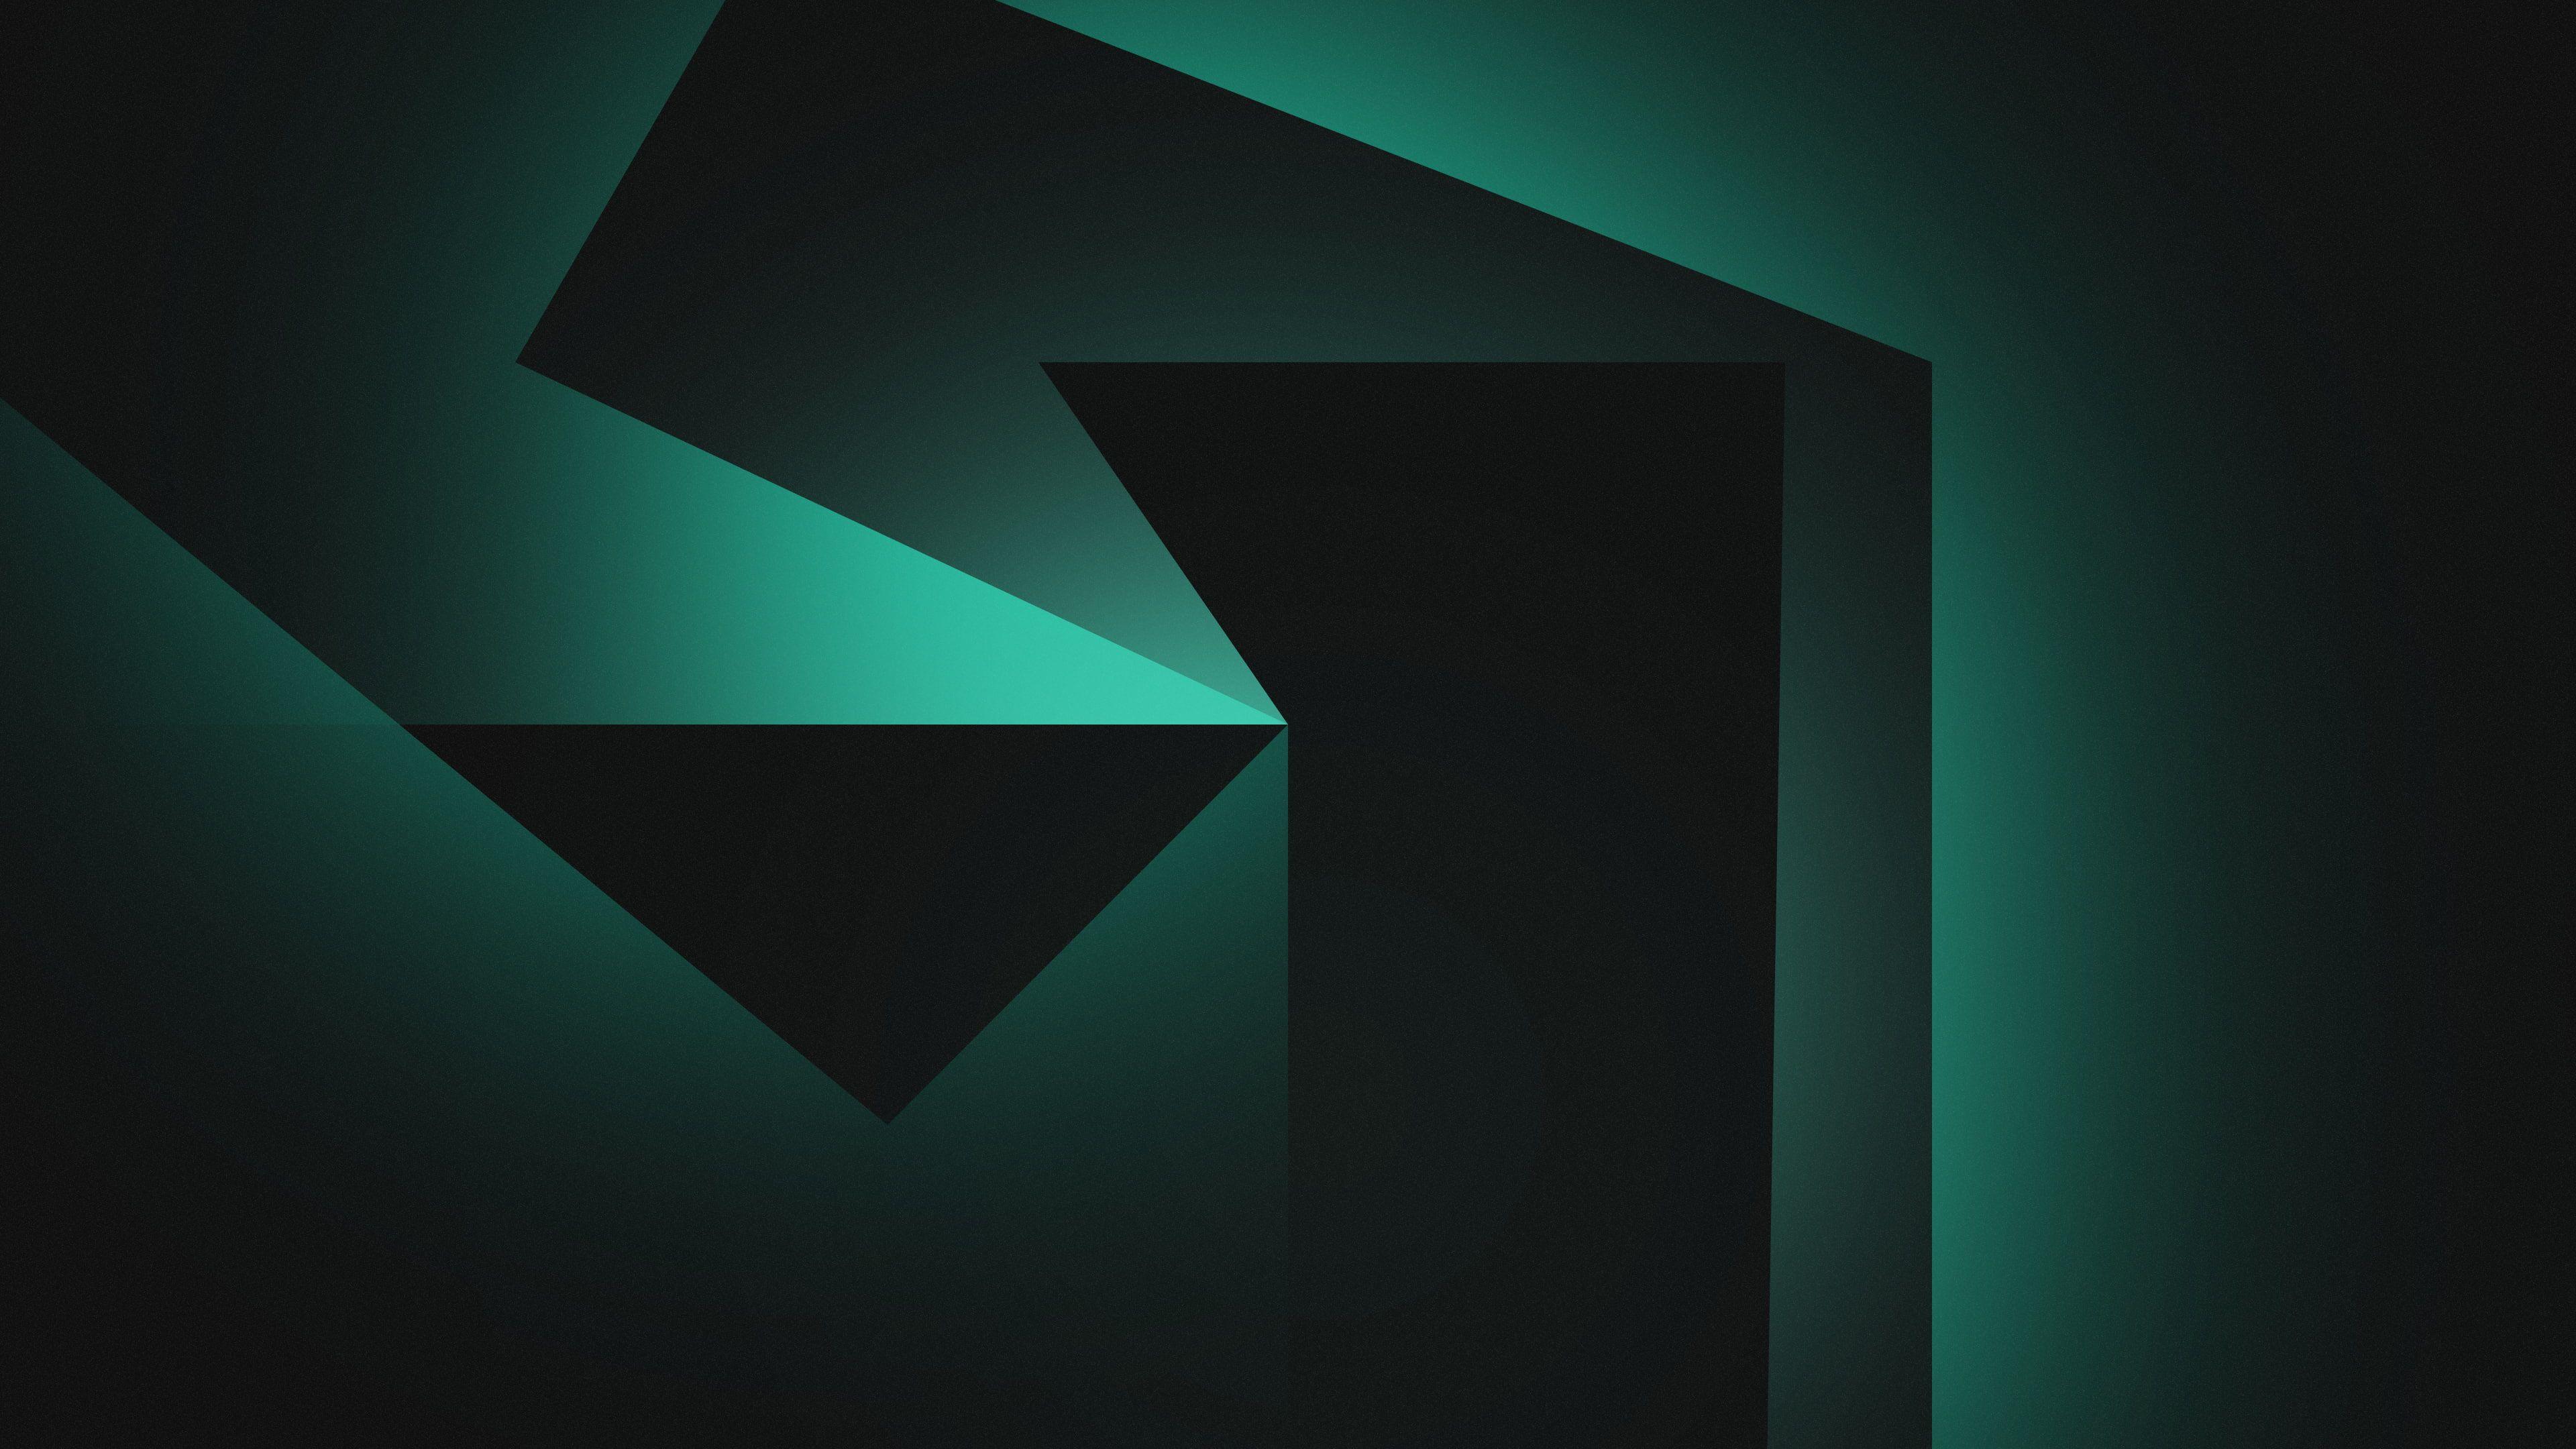 Shapes Geometric Dark Background Gradient Green 4k Black 4k Wallpaper Hdwallpaper Desktop In 2020 Dark Backgrounds Geometric Dark Wallpaper